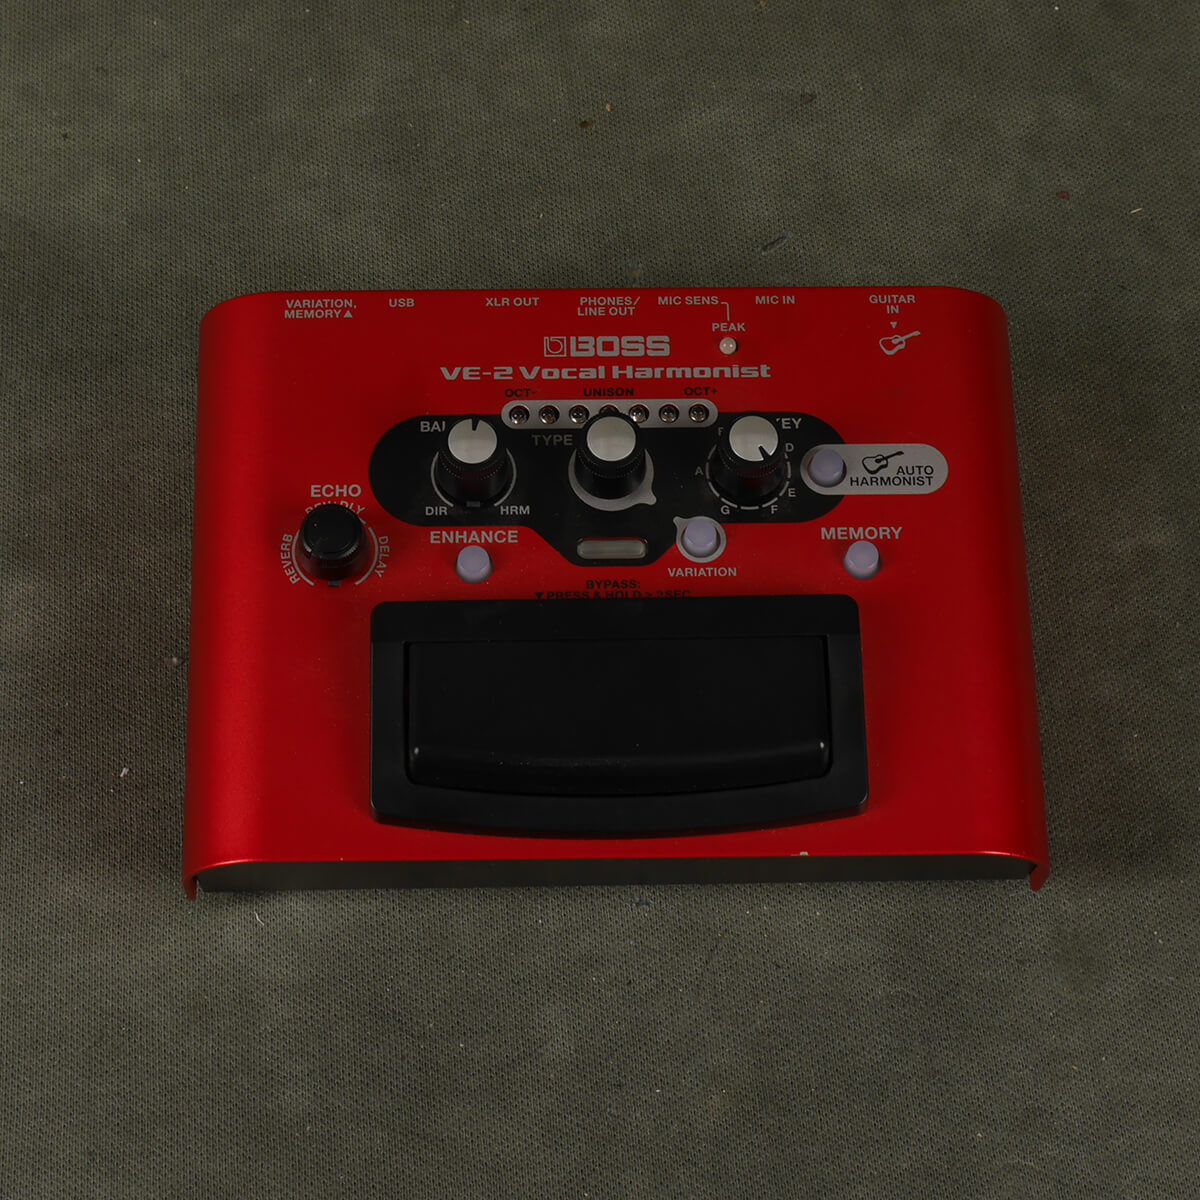 Boss VE-2 Vocal Harmonist FX Pedal - 2nd Hand